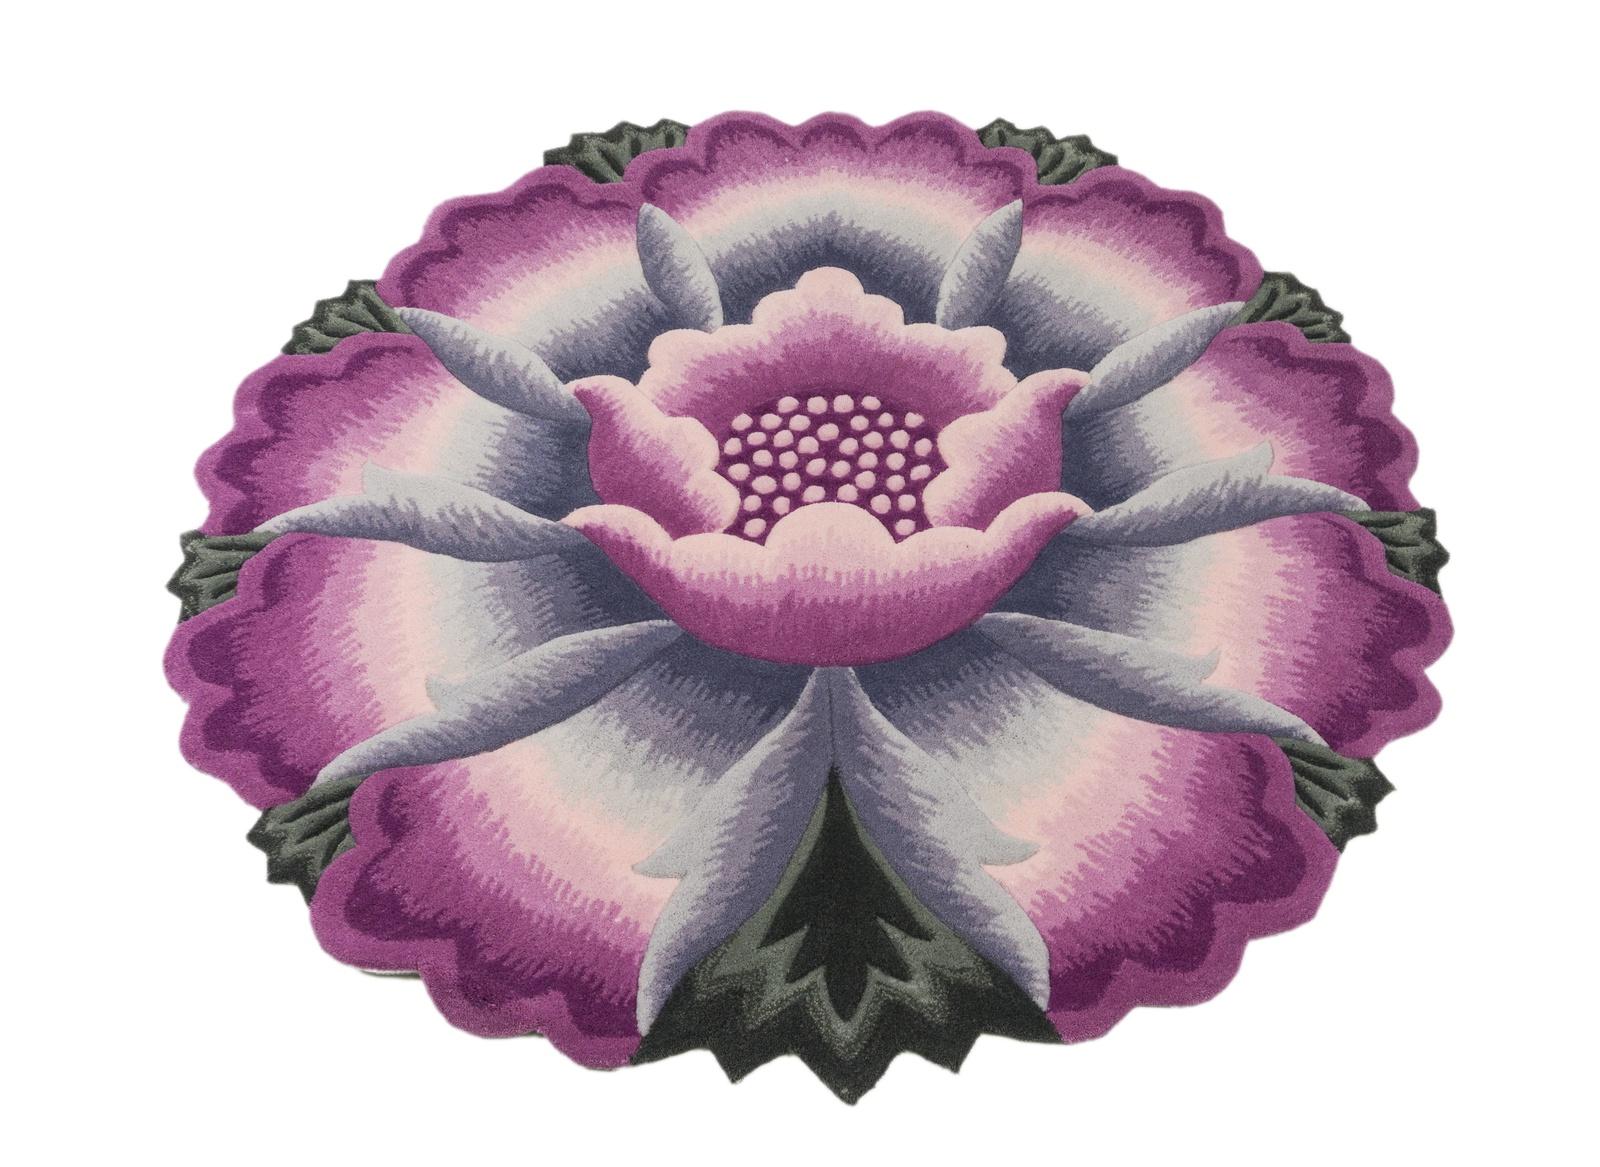 Ковер MADONNA 1,2х1,2м, круг, фиолетовый